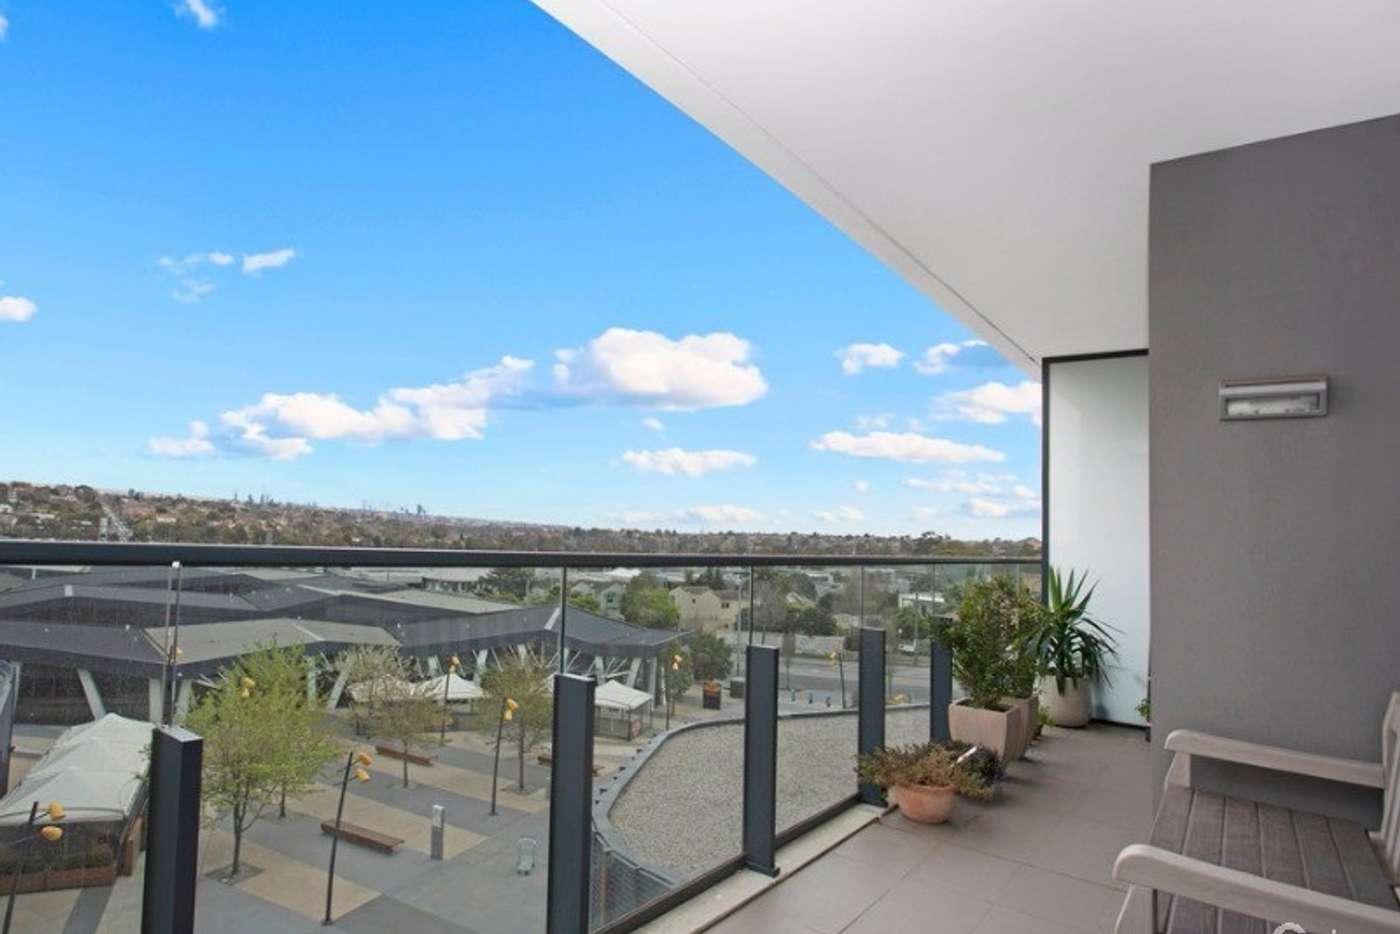 Main view of Homely apartment listing, 706/770B Toorak Road, Glen Iris VIC 3146